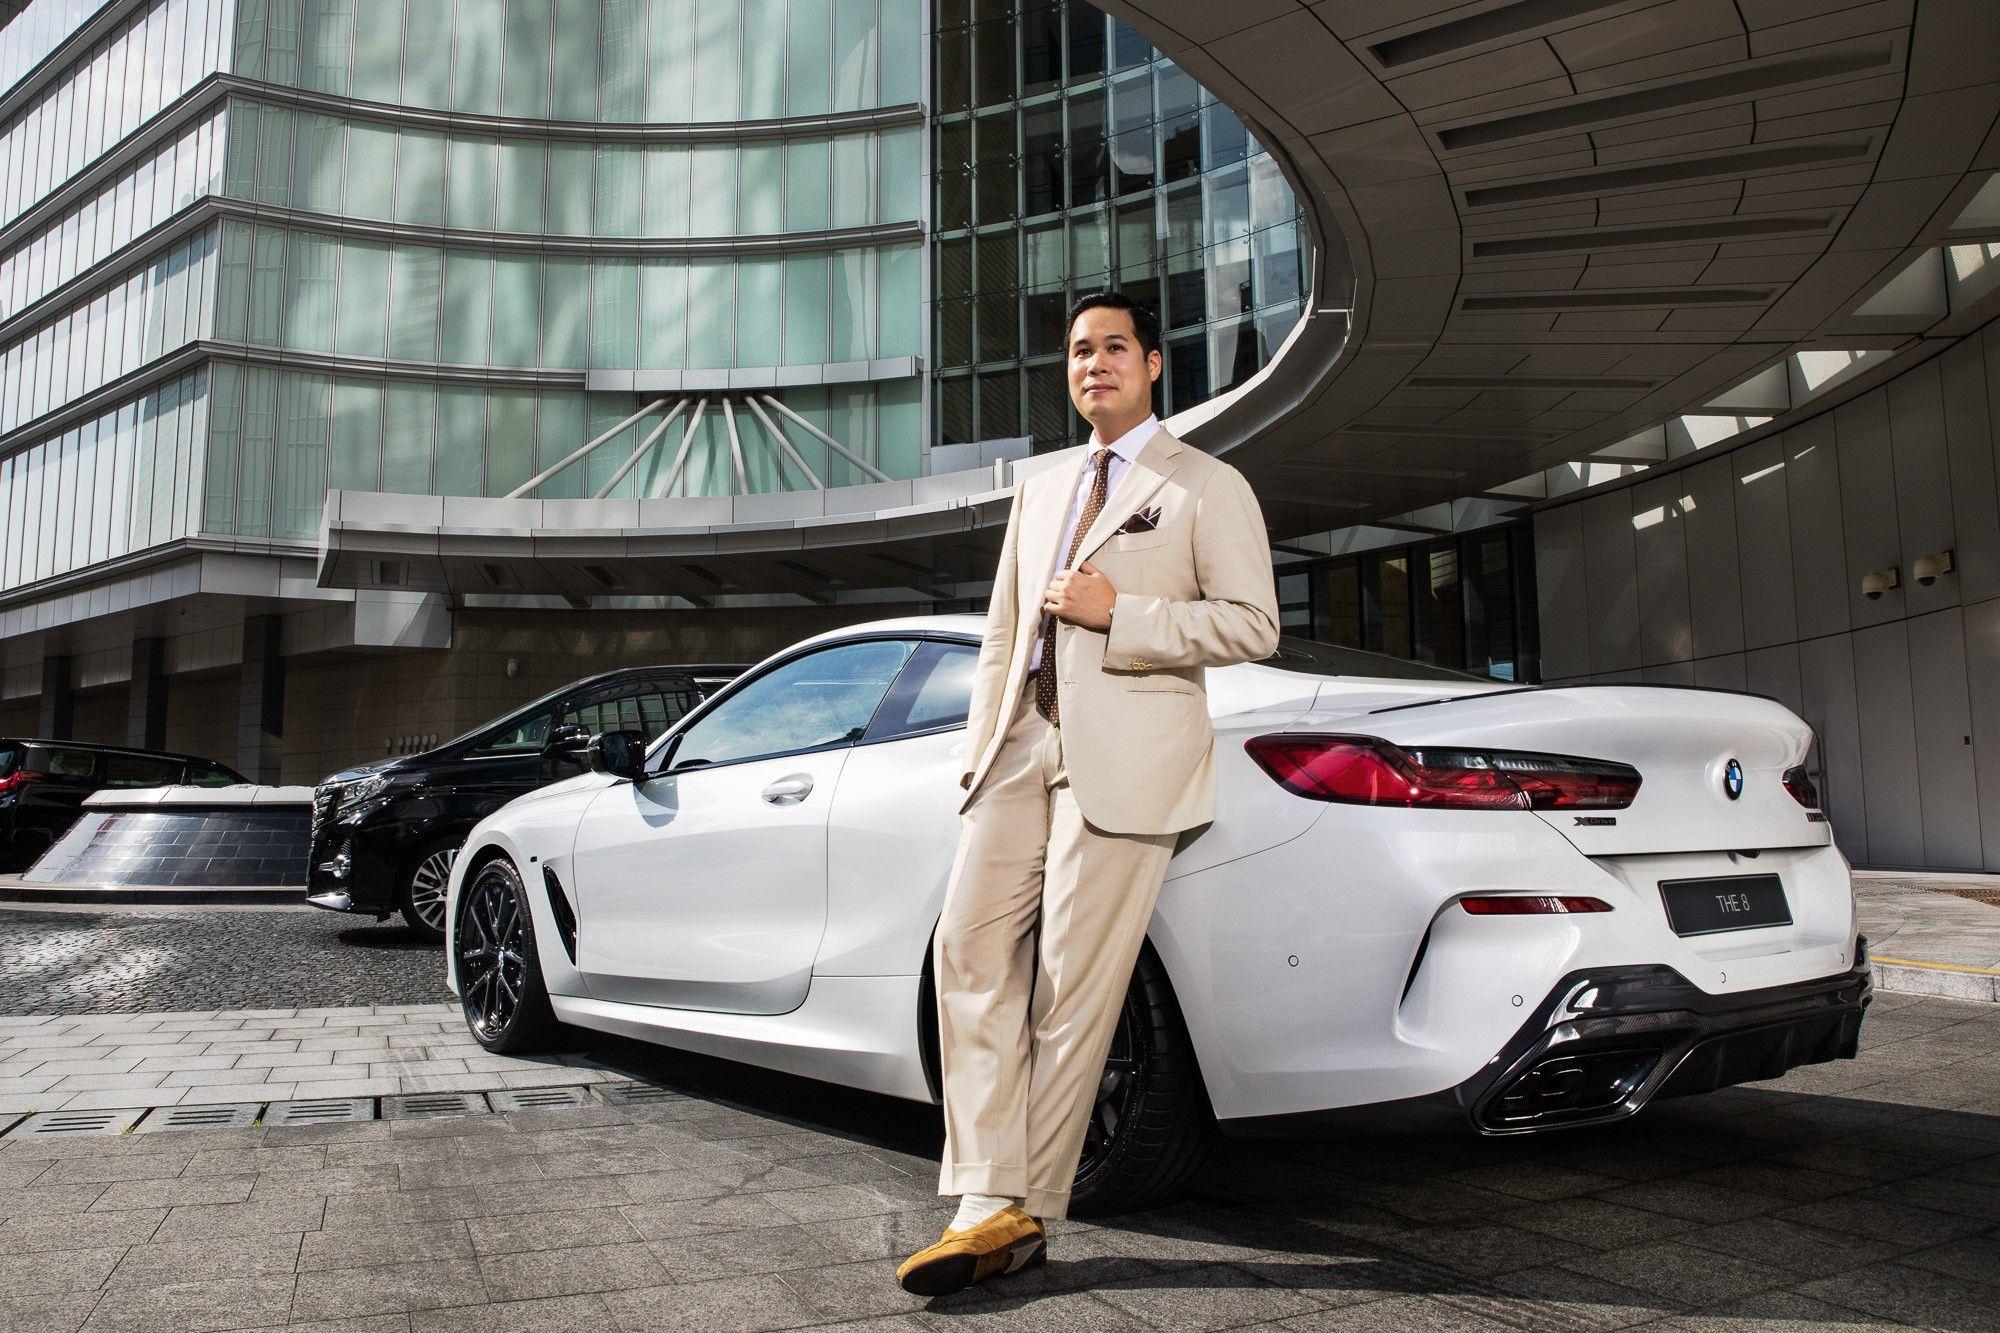 8 Essentials To Be A Gentleman With Brandon Chau